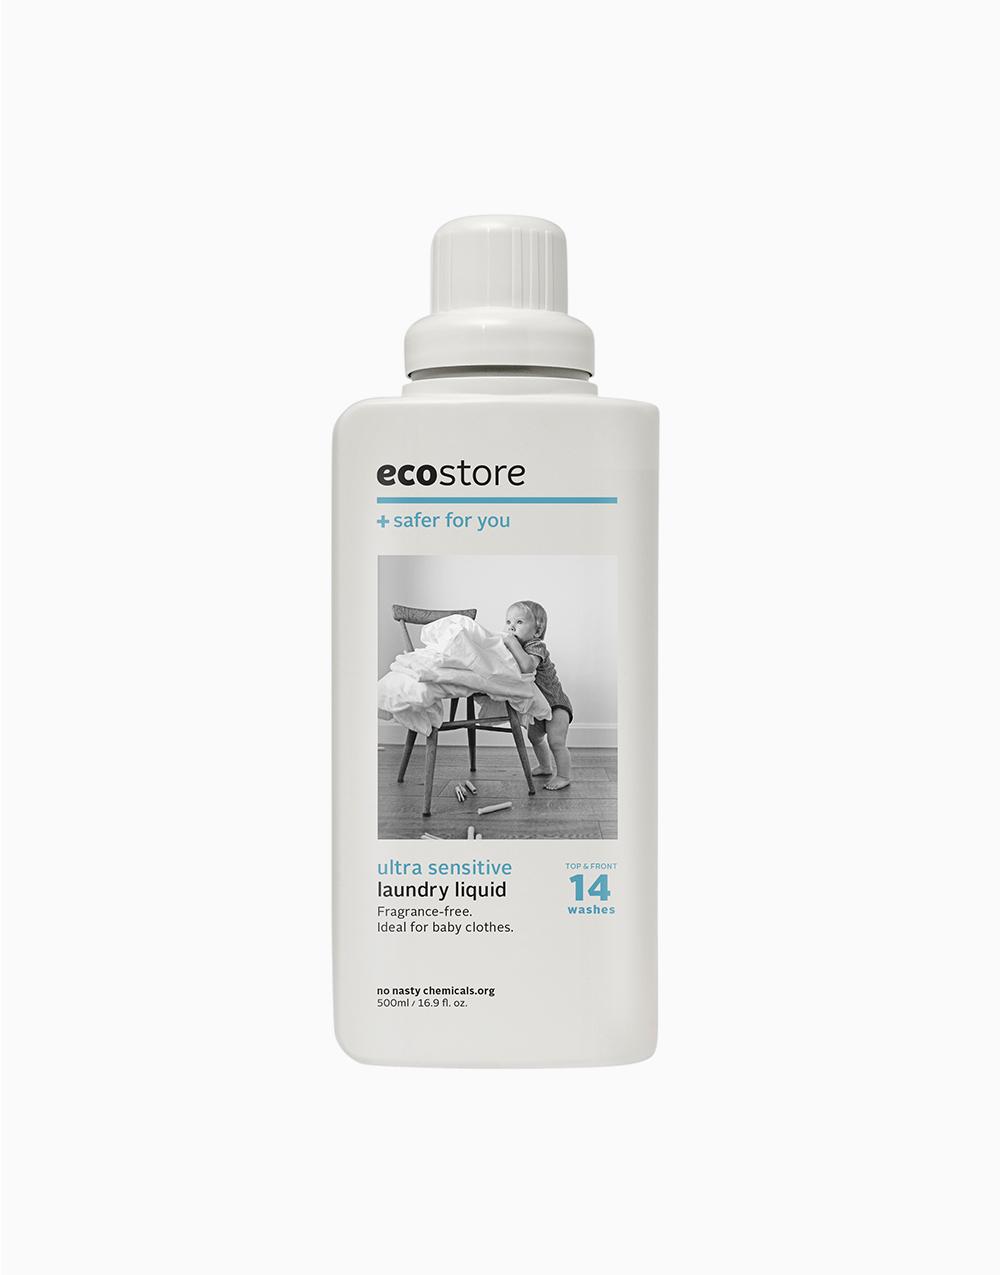 Baby Laundry Liquid (500ml) by Ecostore